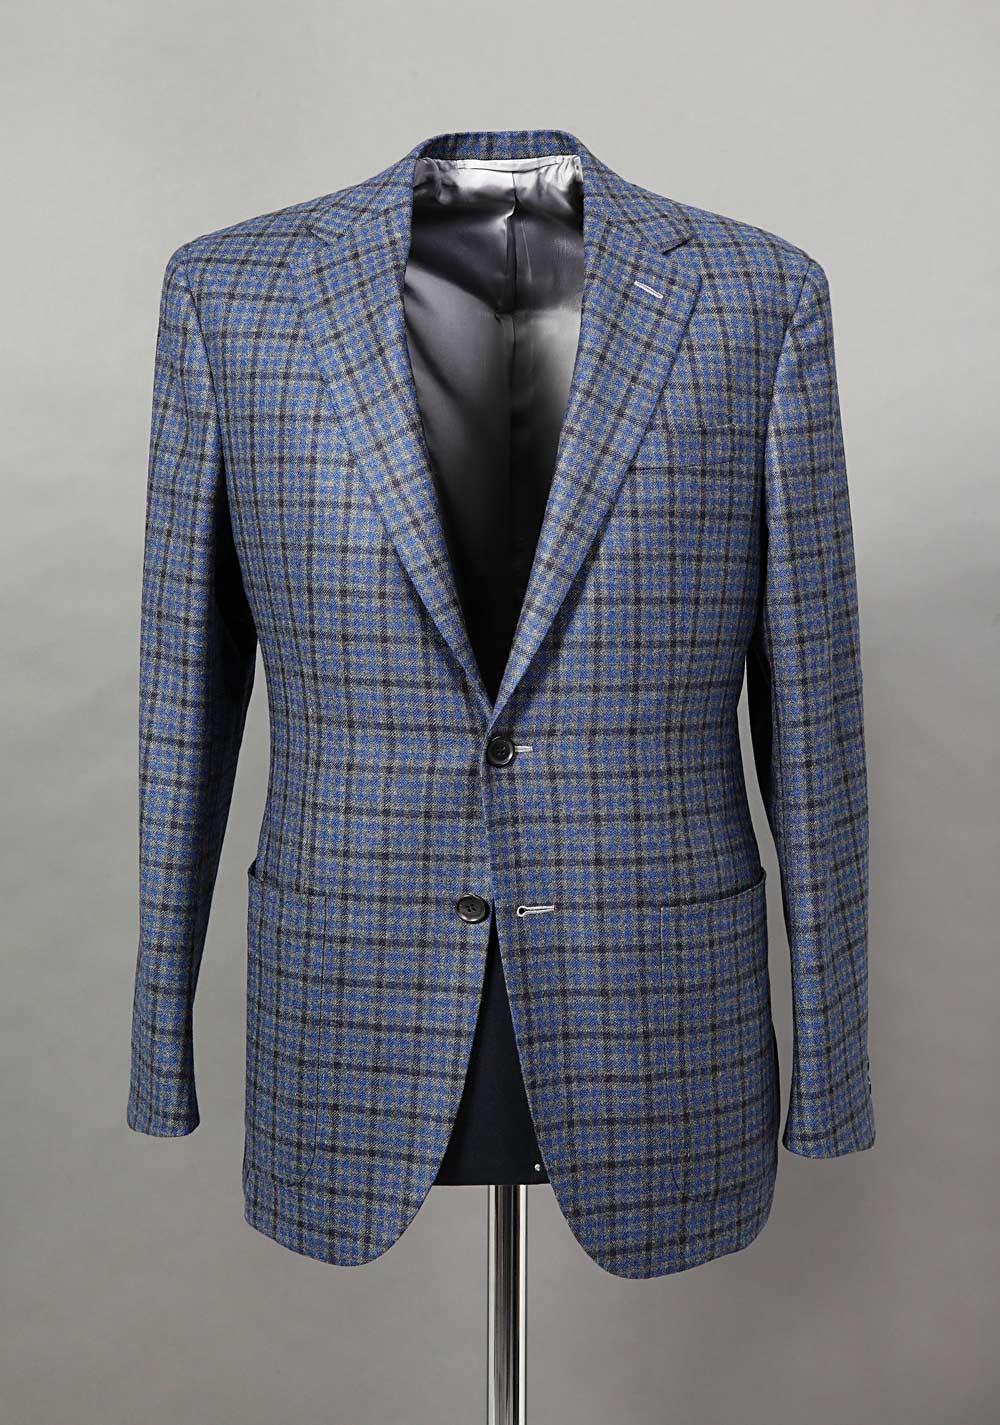 Santandrea sport jacket